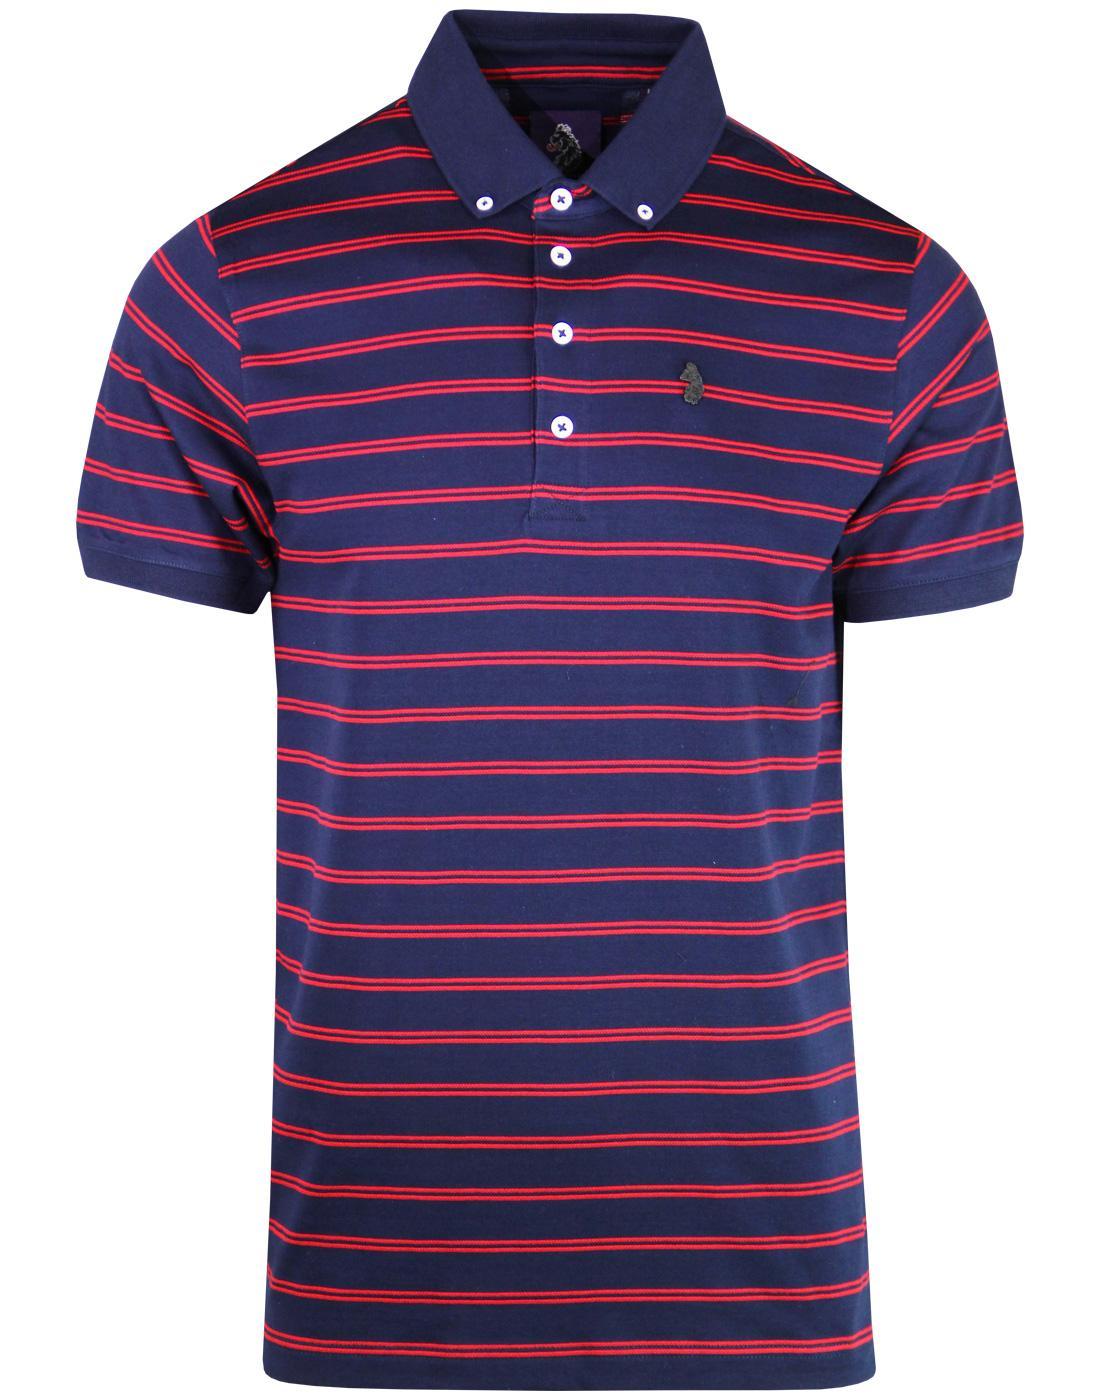 Jedory LUKE Mens Retro Mod Woven Stripe Polo Shirt